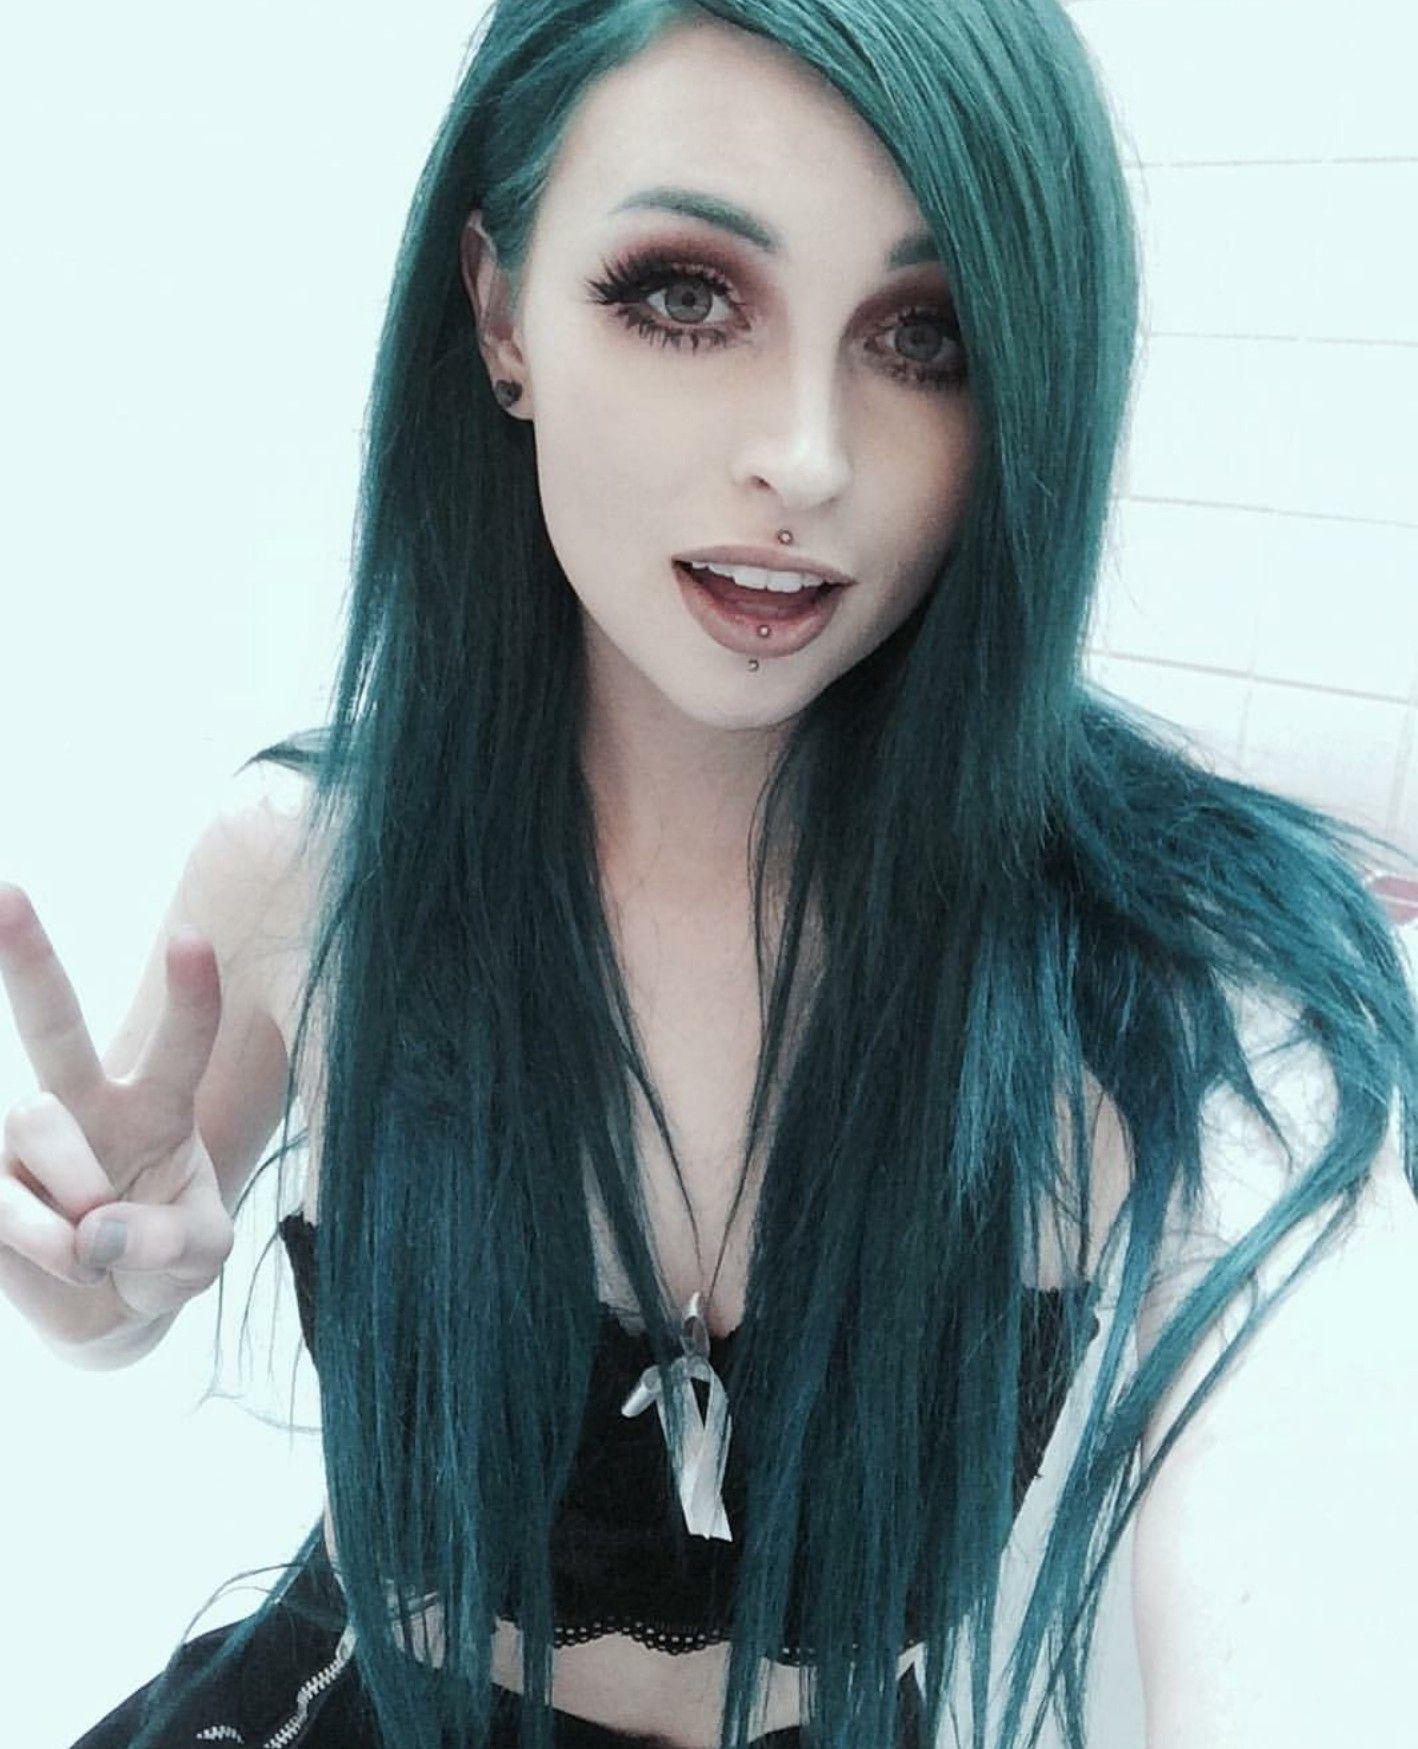 Pretty emo girl hairstyles - Ehotpics.com